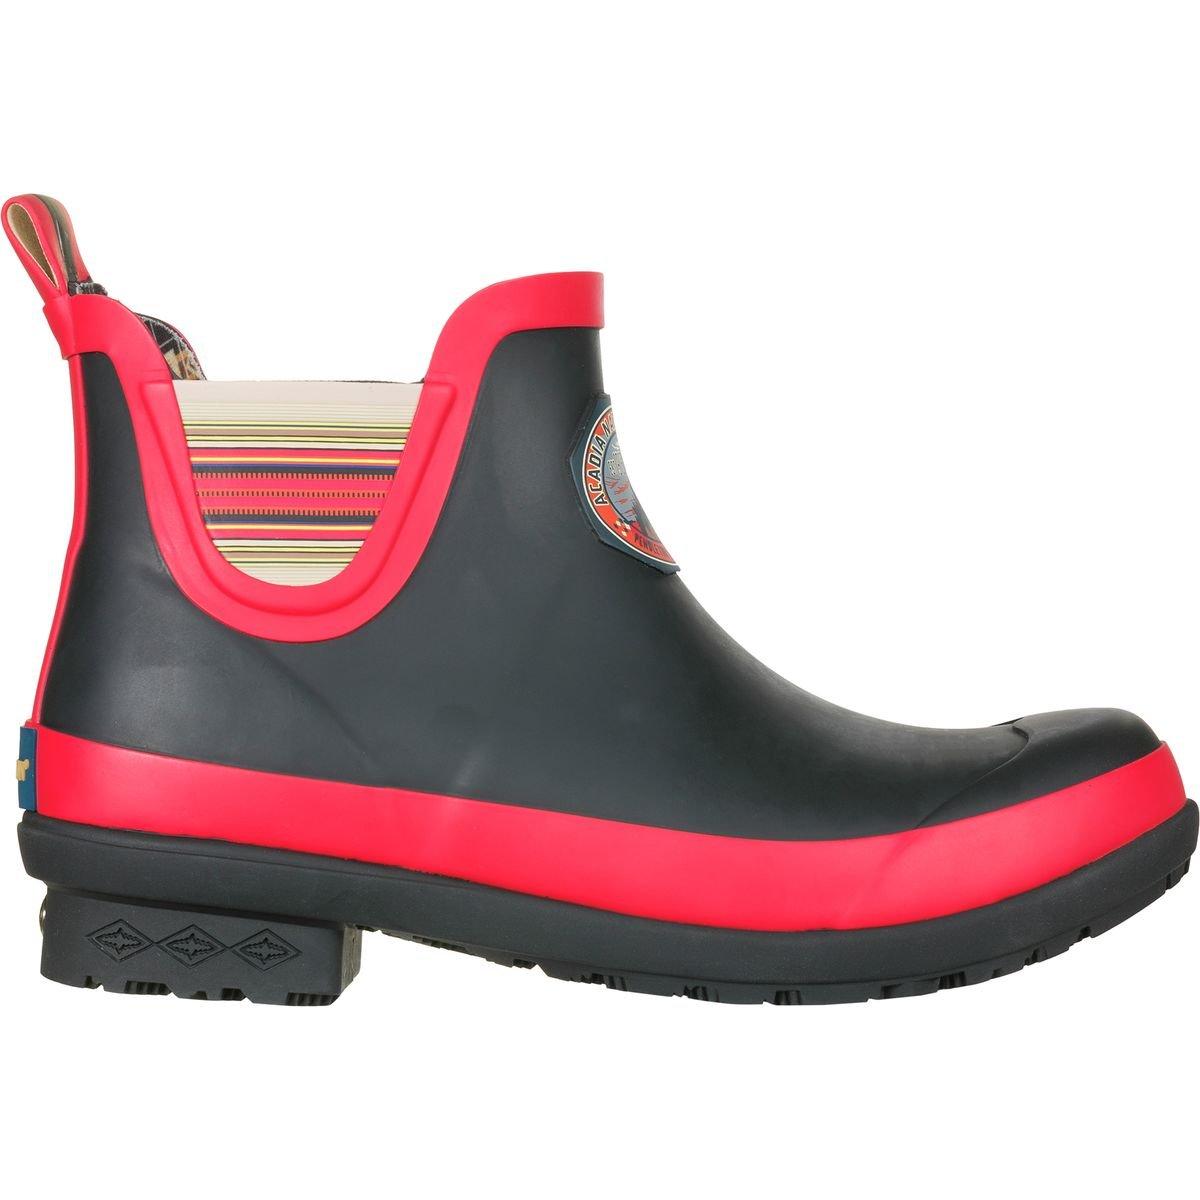 Pendleton Women's Heritage Acadia National Park Chelsea Boot B0771TKH2Z 9 B(M) US|Acadia Black